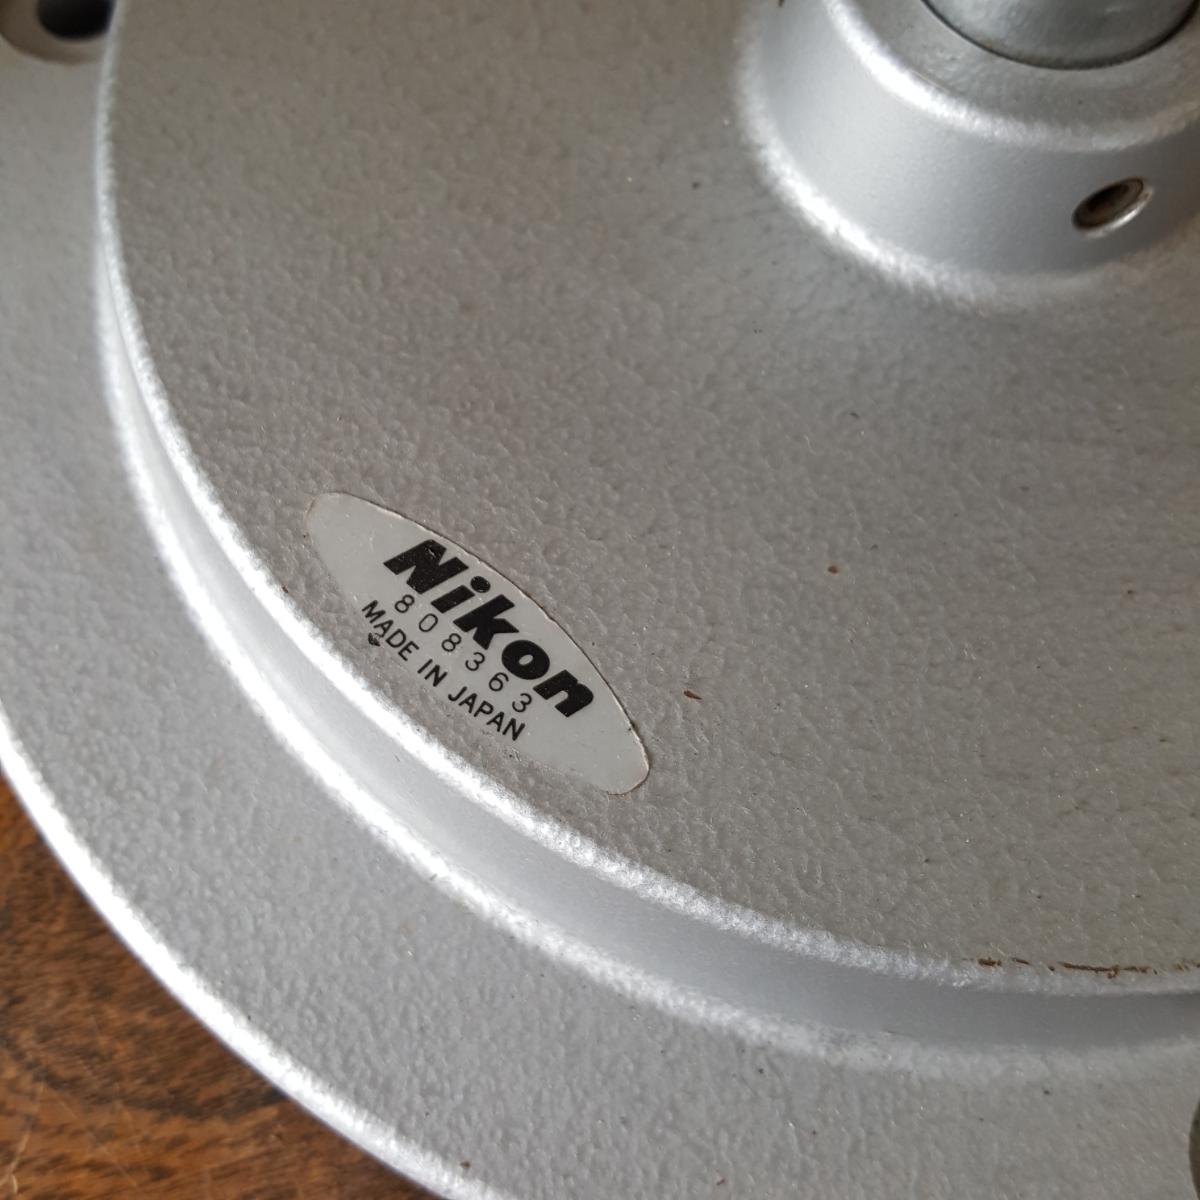 NIKON 実体顕微鏡 レンズ N10x SEIKO 日本製 検査 精密 機器 病院 歯科 顕微鏡 計器 接眼 双眼 ニコン セイコー スタンド 台座 中古 現状 _画像4